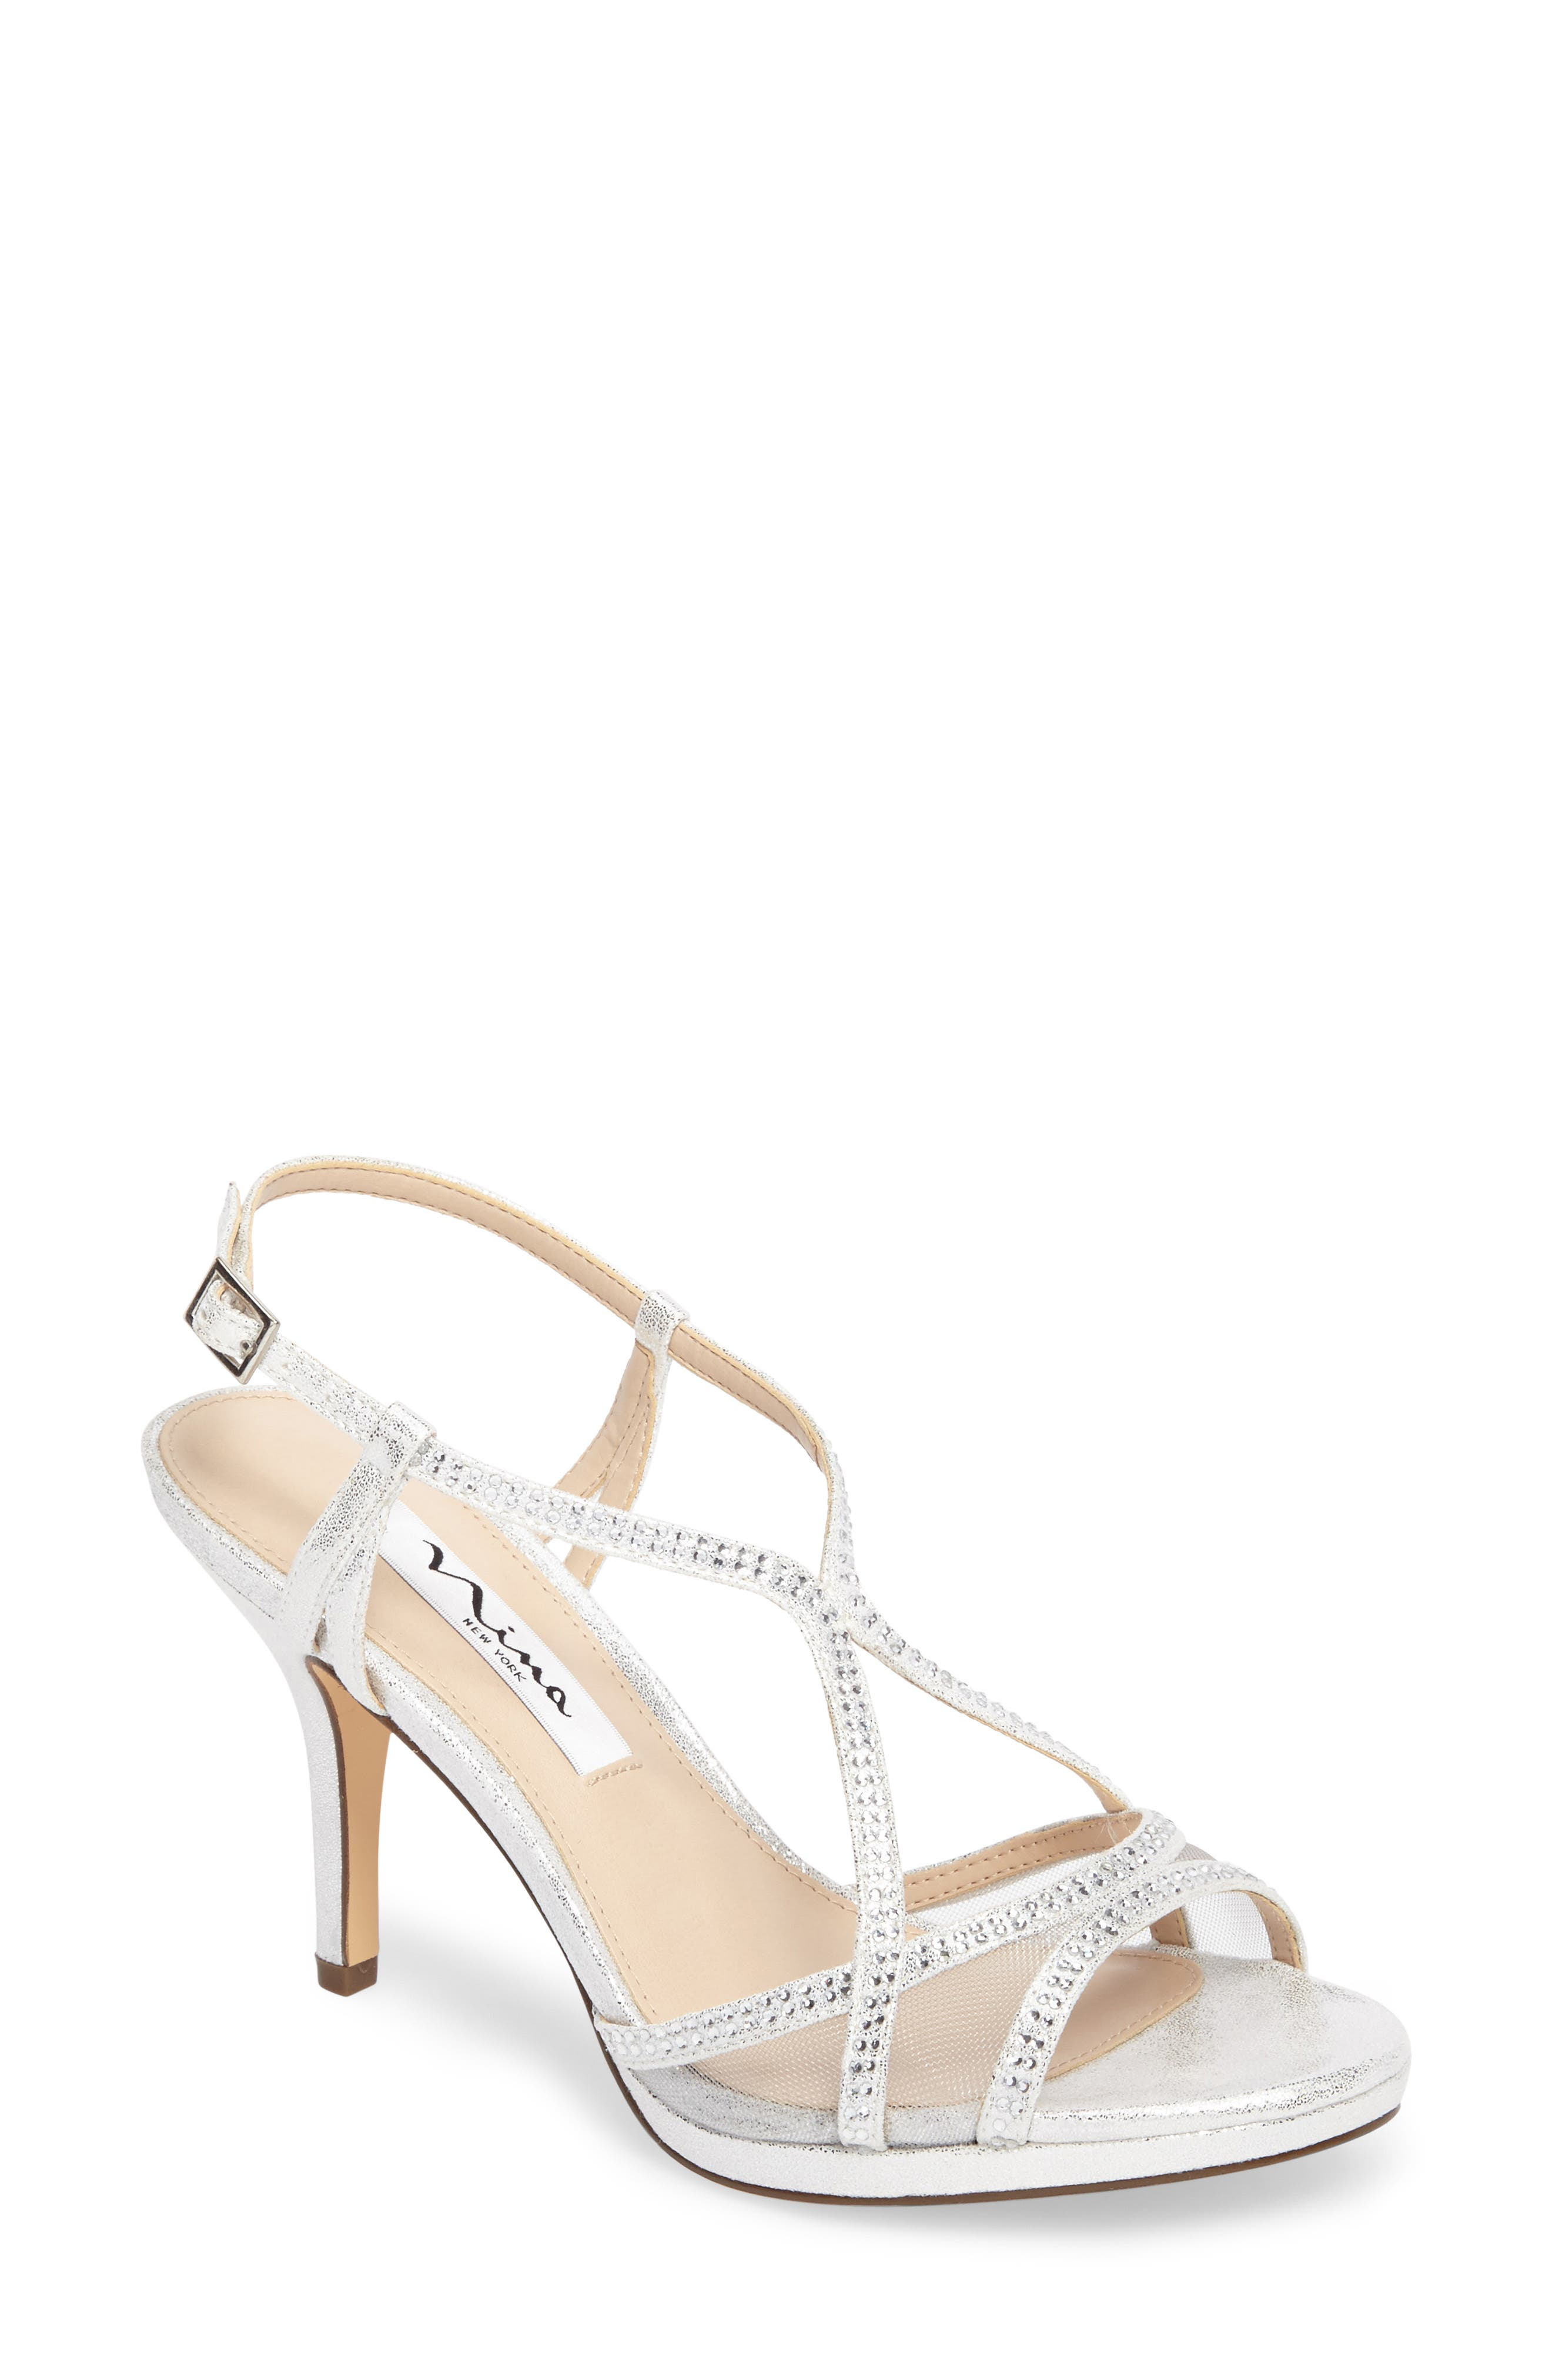 NINA, Blossom Crystal Embellished Sandal, Main thumbnail 1, color, SILVER FABRIC